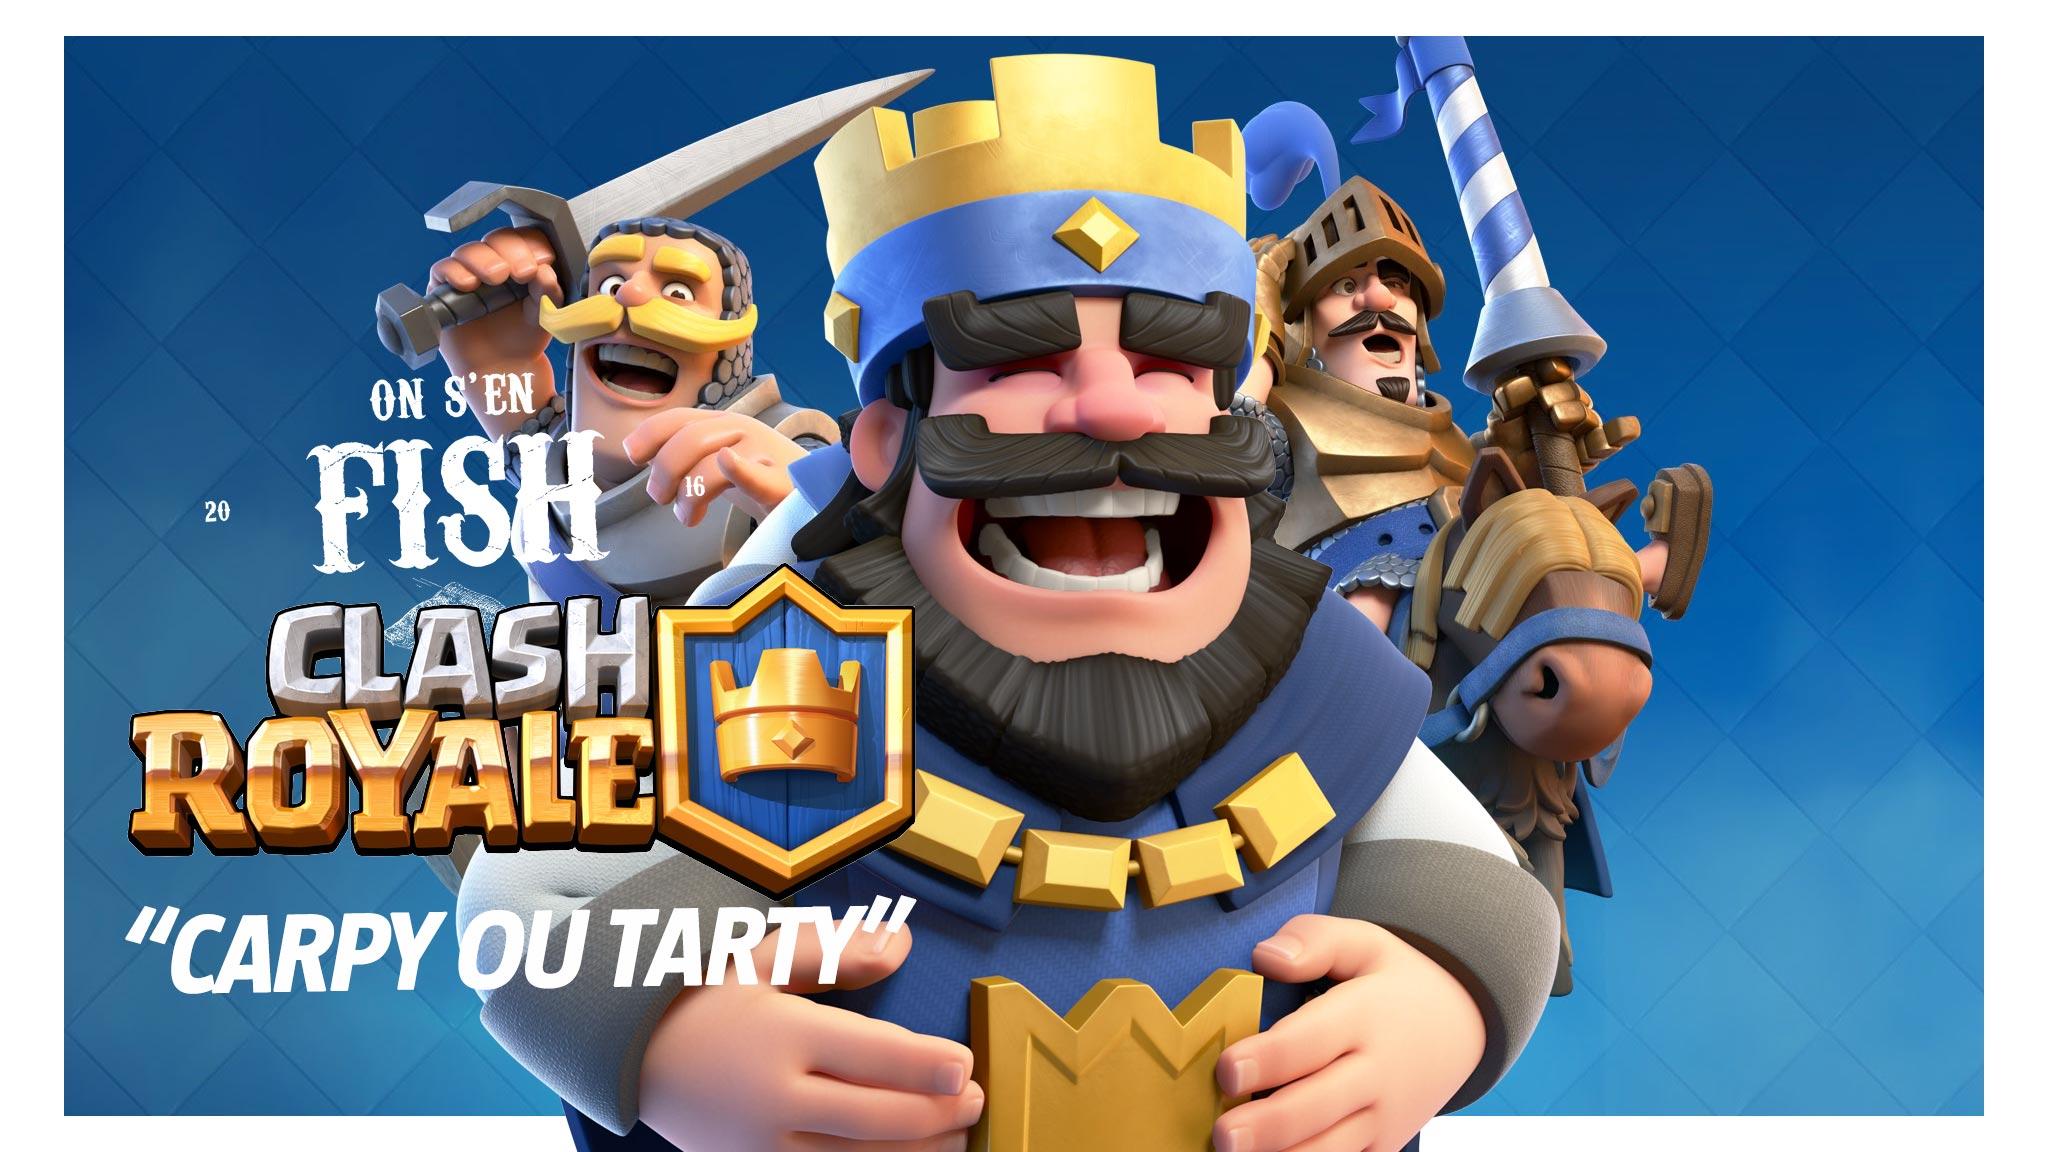 on-s-en-fish-header-article-clash-royale